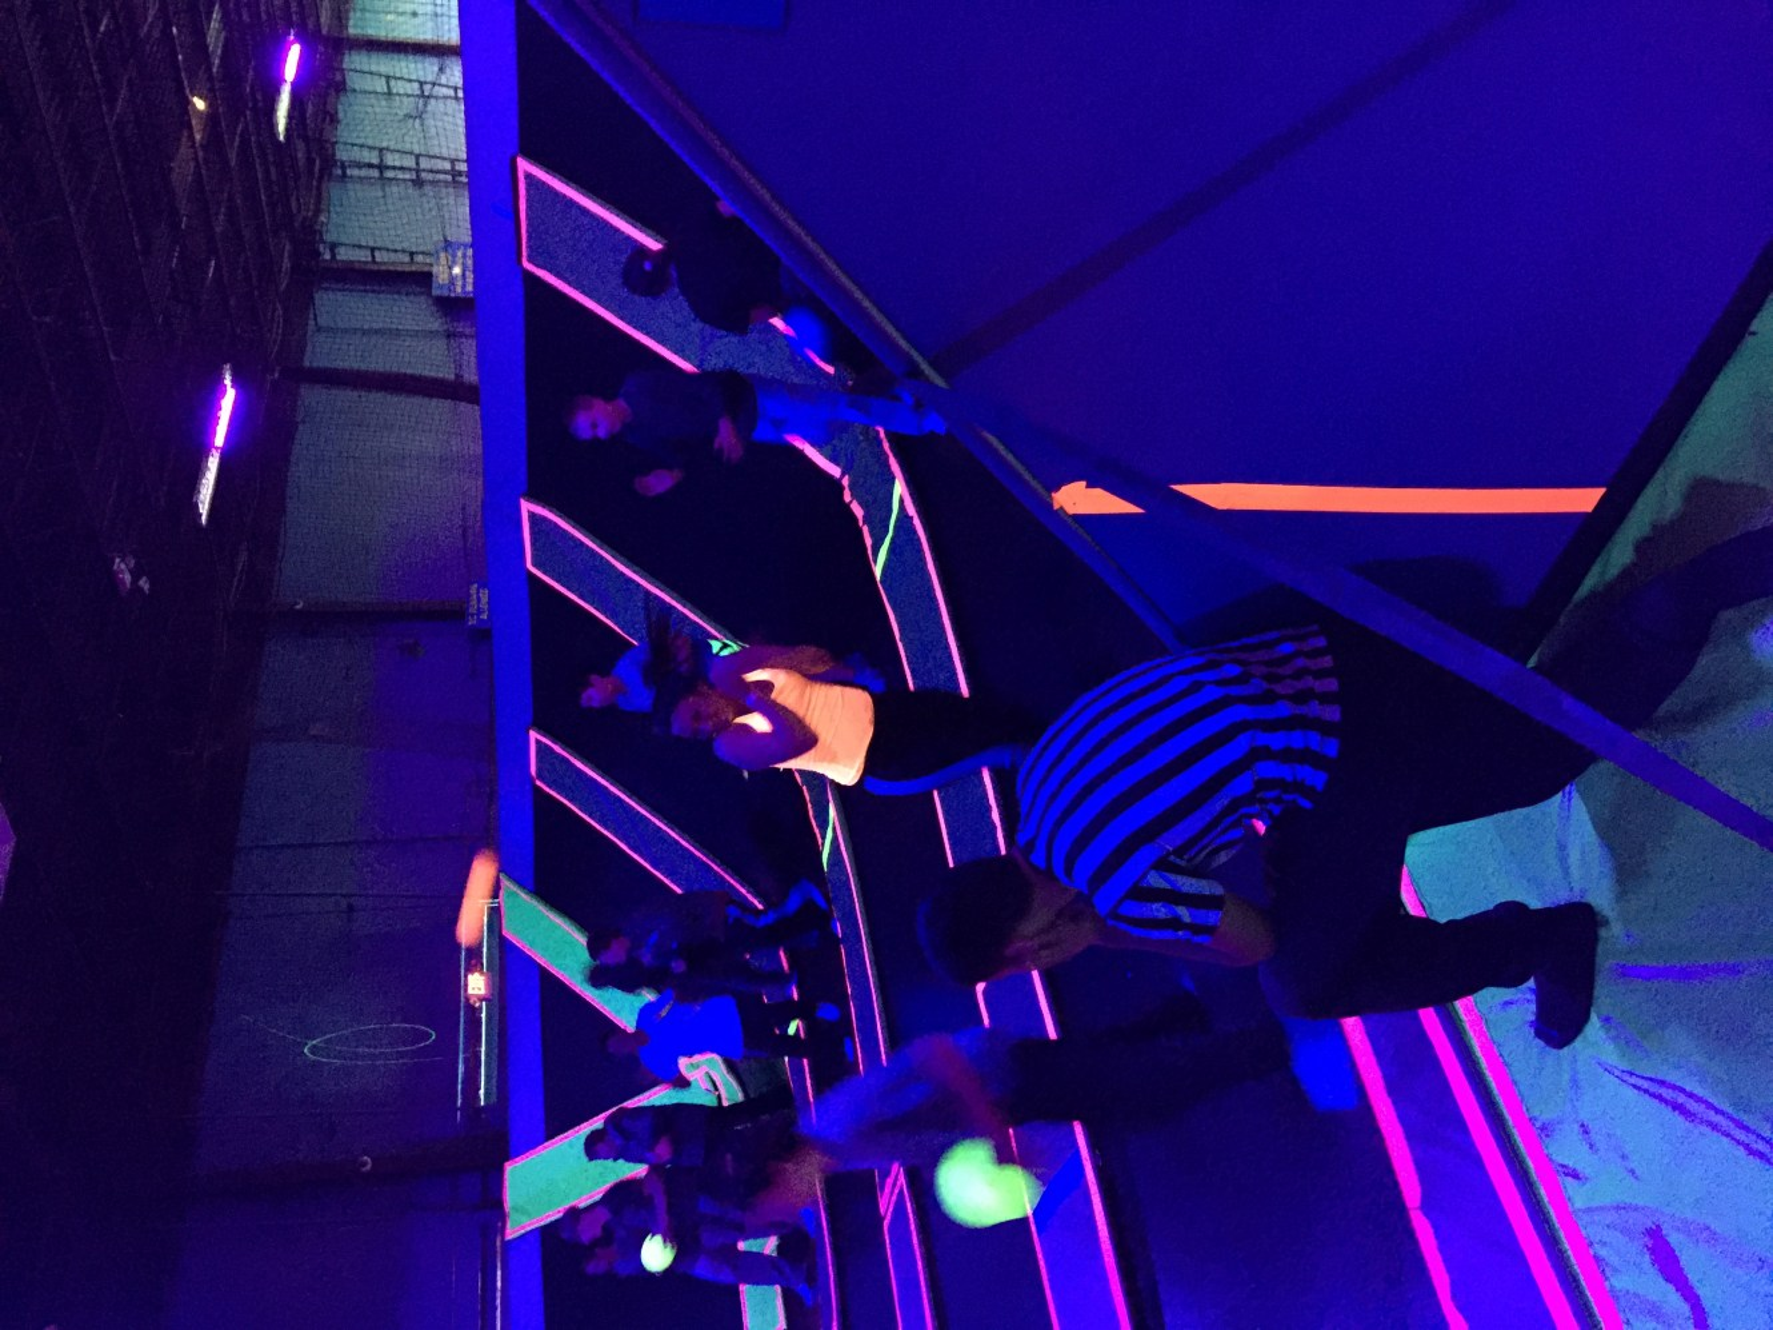 20150228 Phs LUMC Youth Bounce (43)